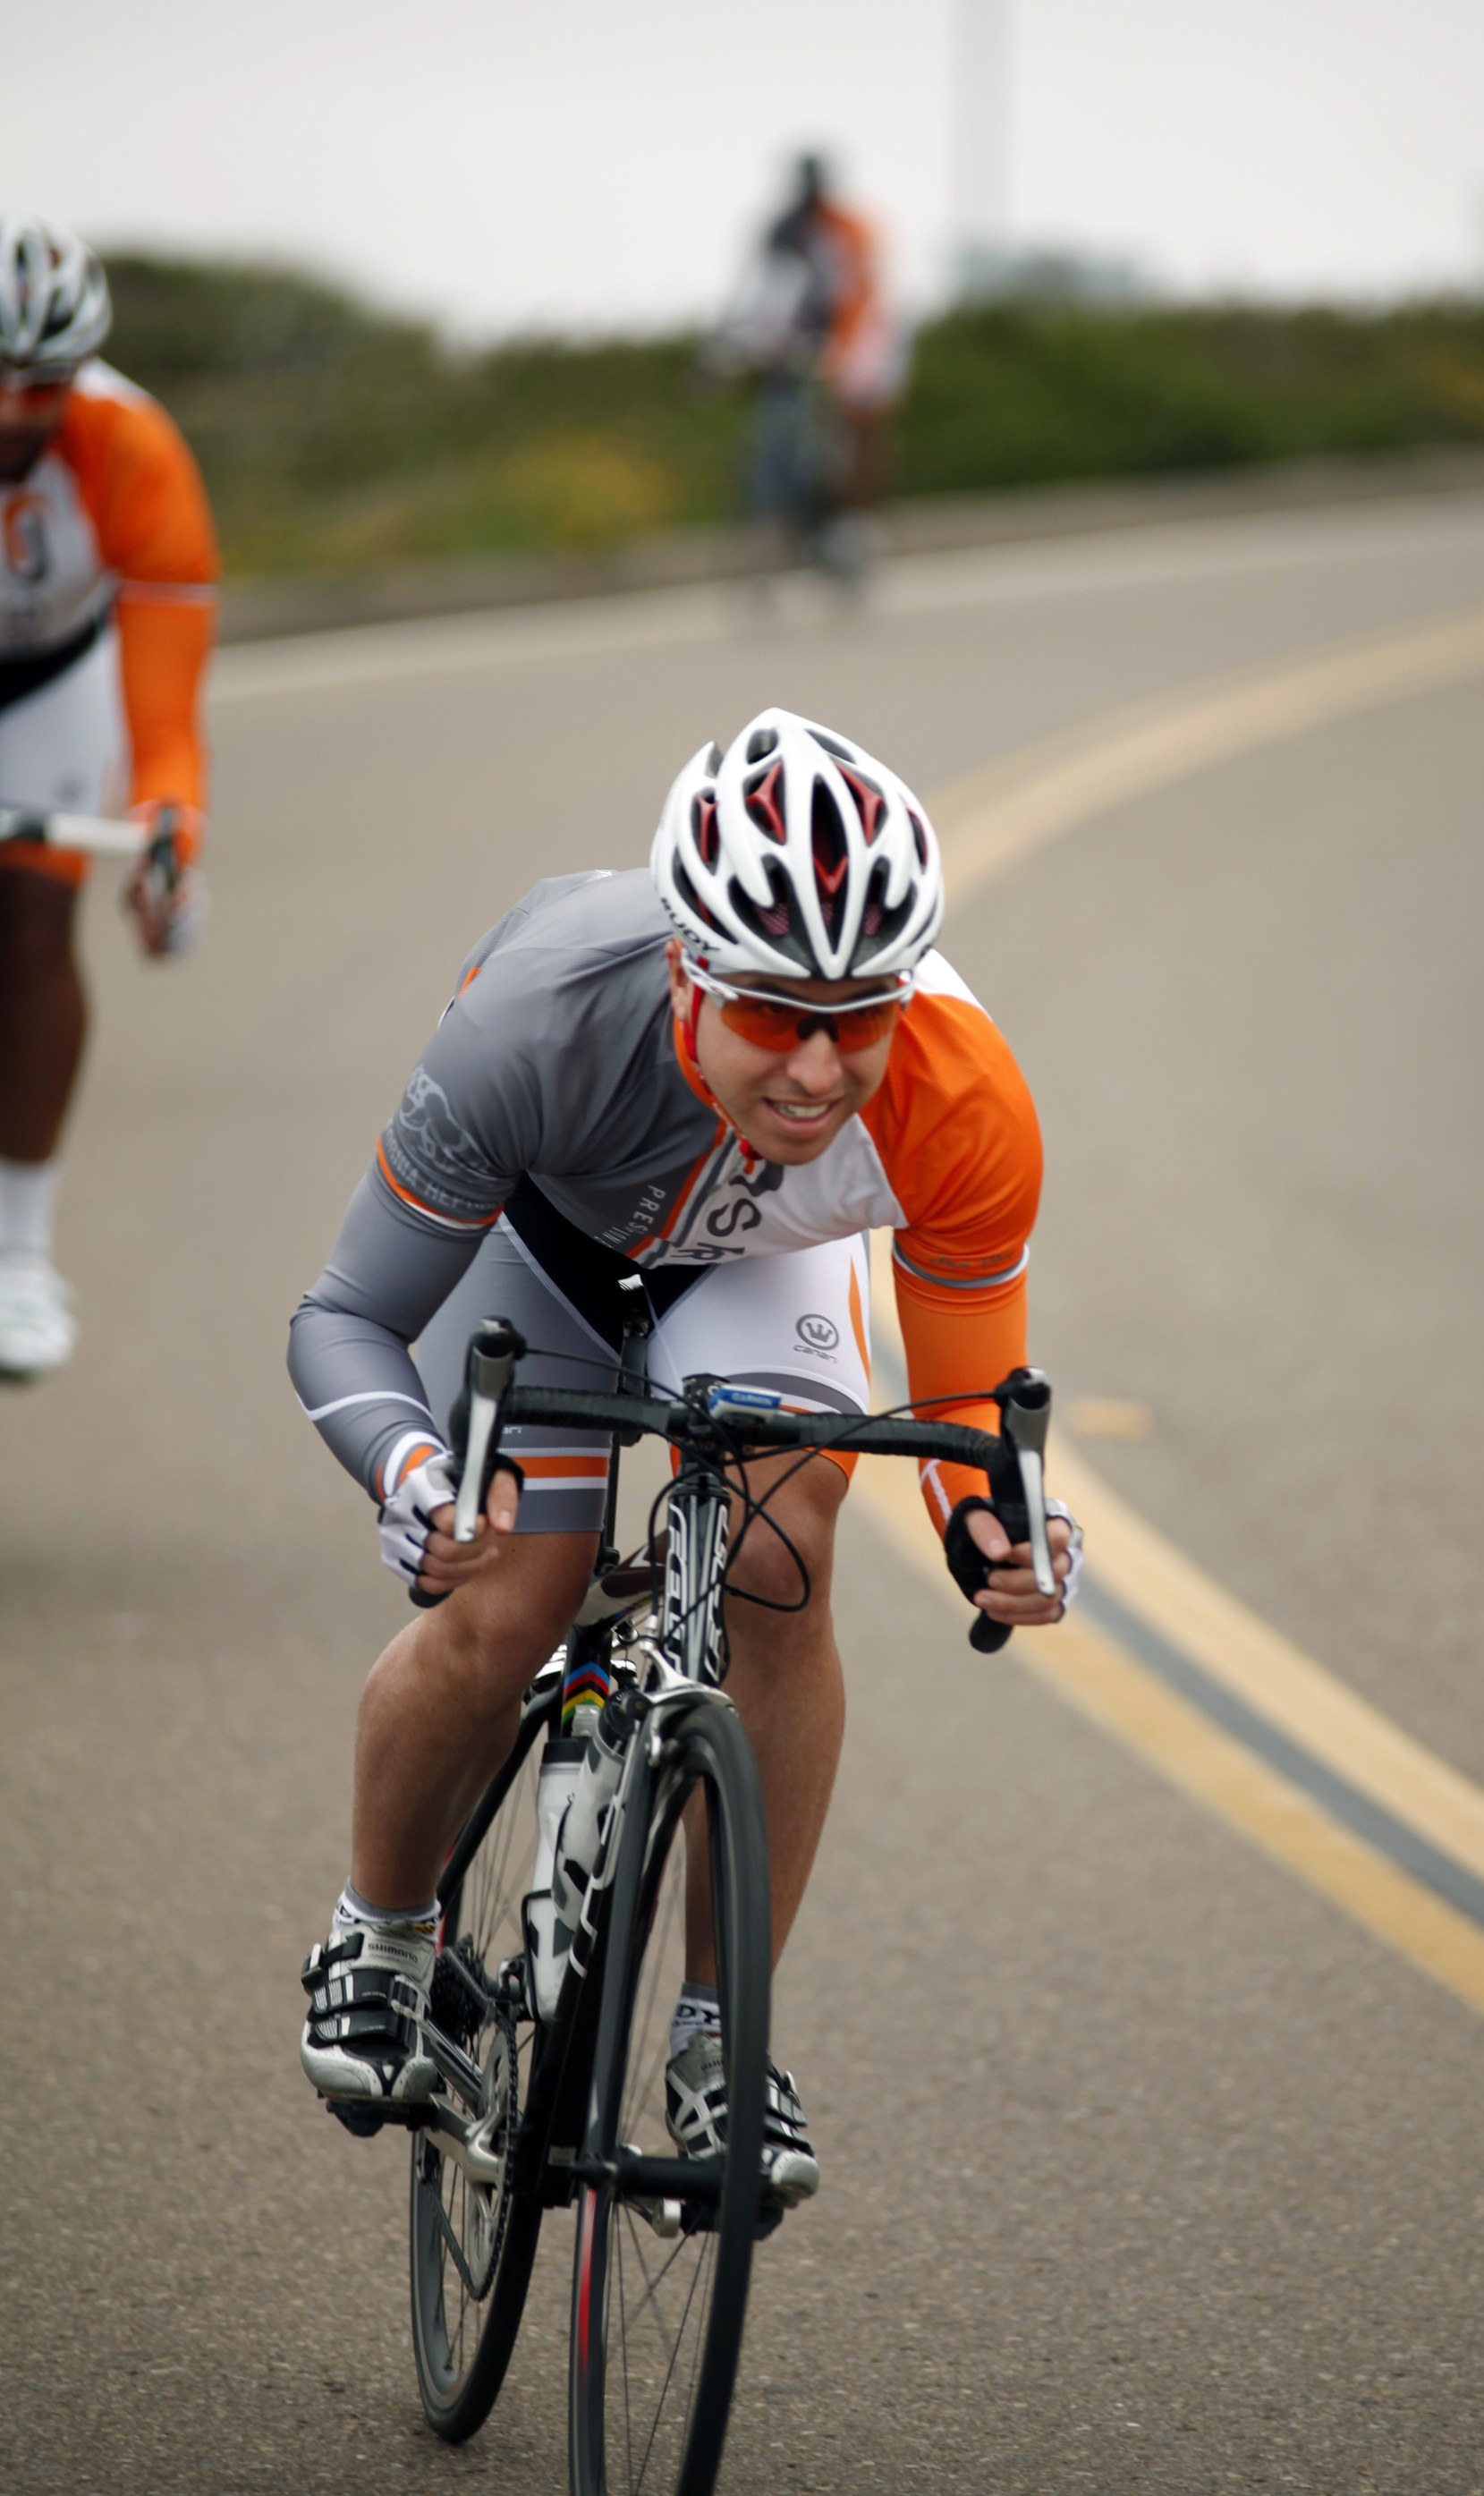 Prescription Cycling Sunglasses, Best cycling sunglasses, cycling sunglasses